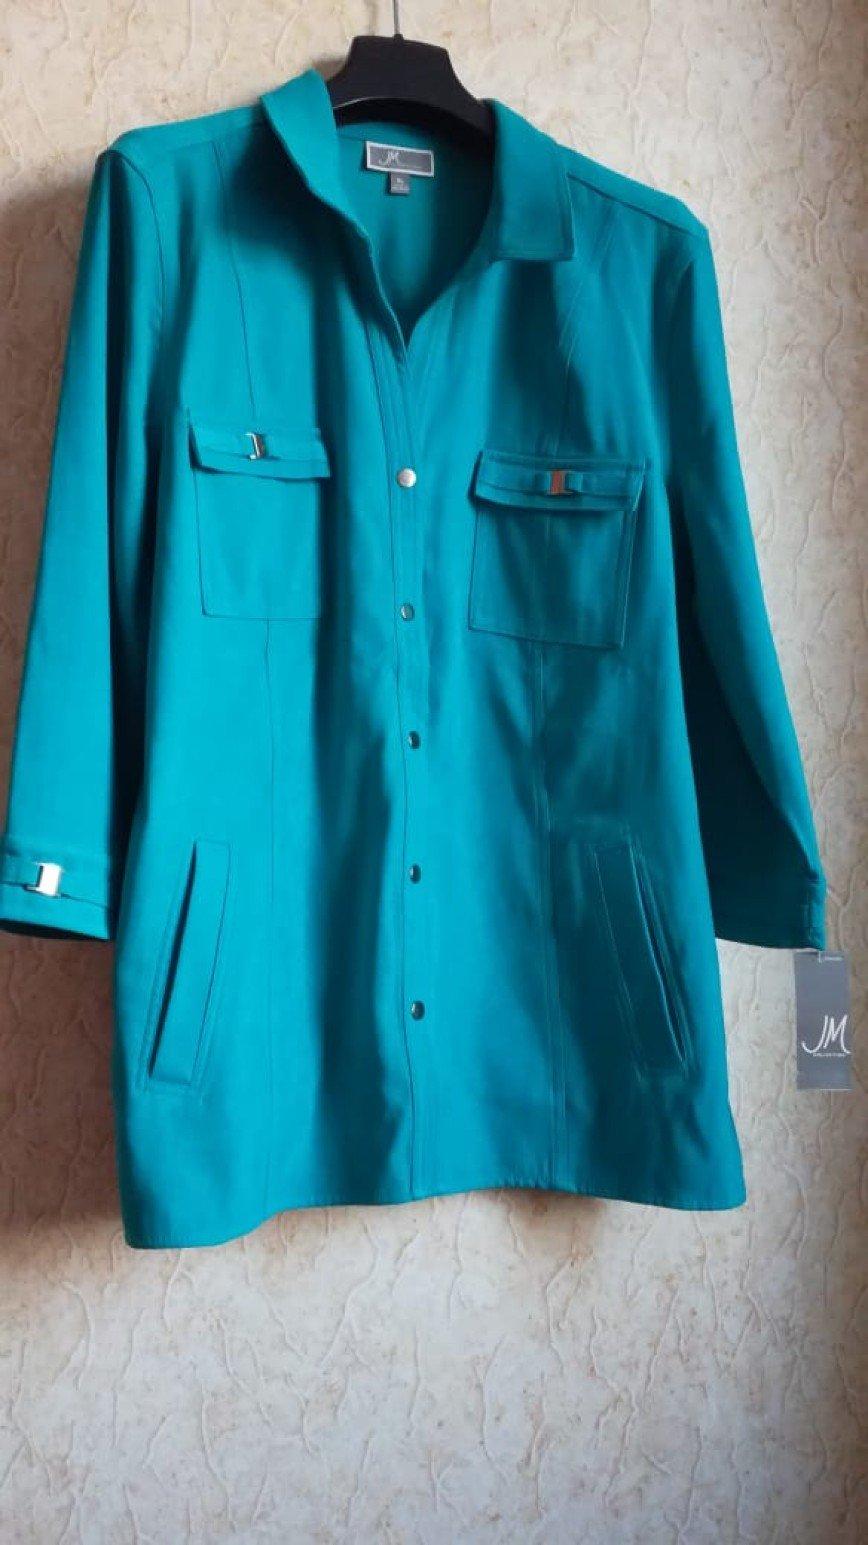 JM Collection. Новый кардиган XL на кнопках бирюзового цвета с 2-мя карманами на груди, 90polyester/10spandex, длина по спине 72см. Цена 1400 руб.